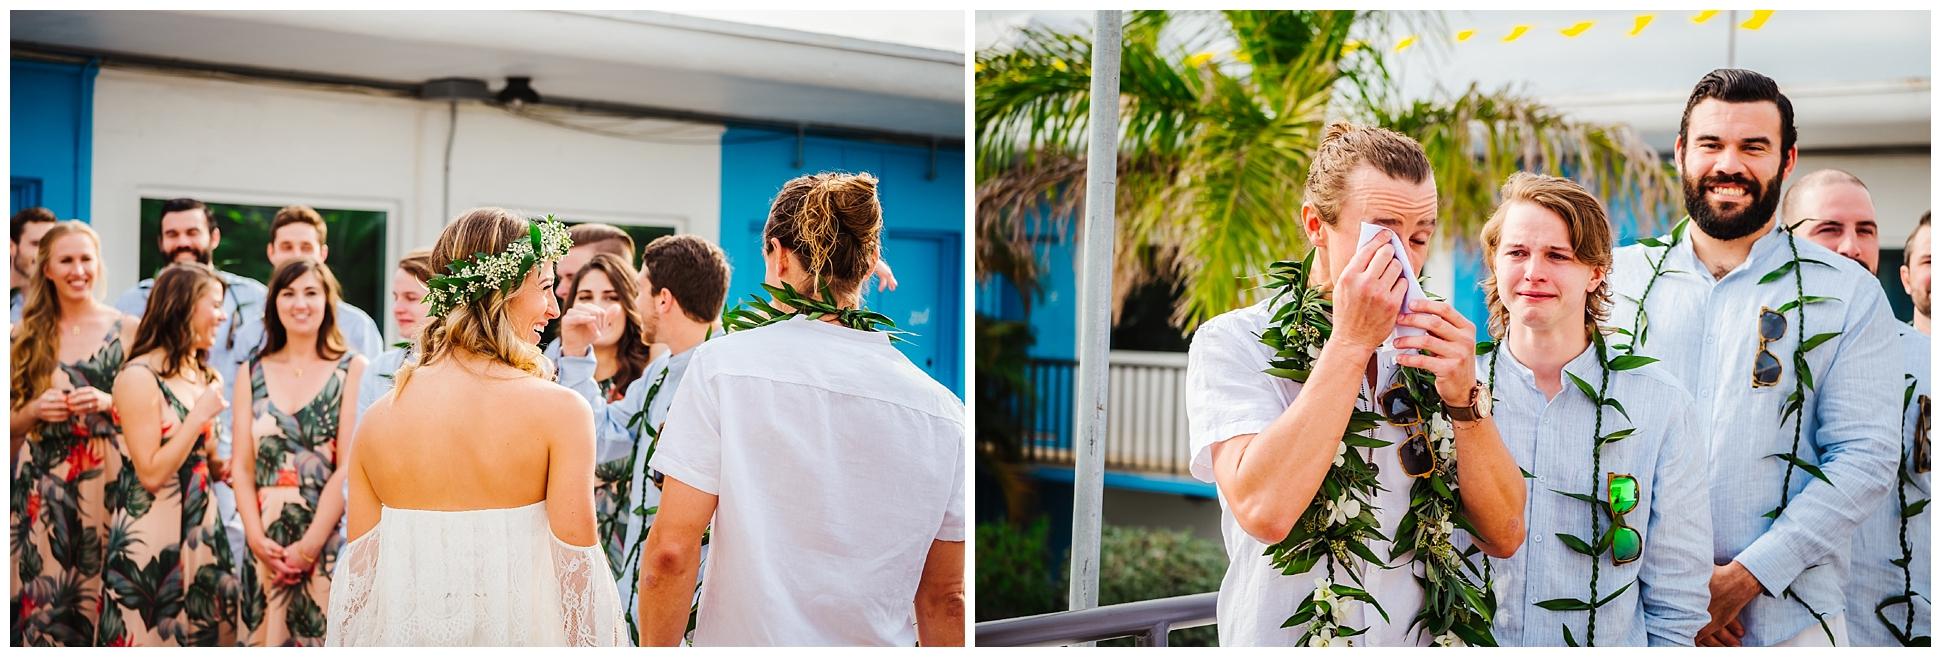 tampa-bay-wedding-photographer-barefoot-post-card-inn-tropical-hawaiin-lei-pink-pineapples-flower-crown_0140.jpg